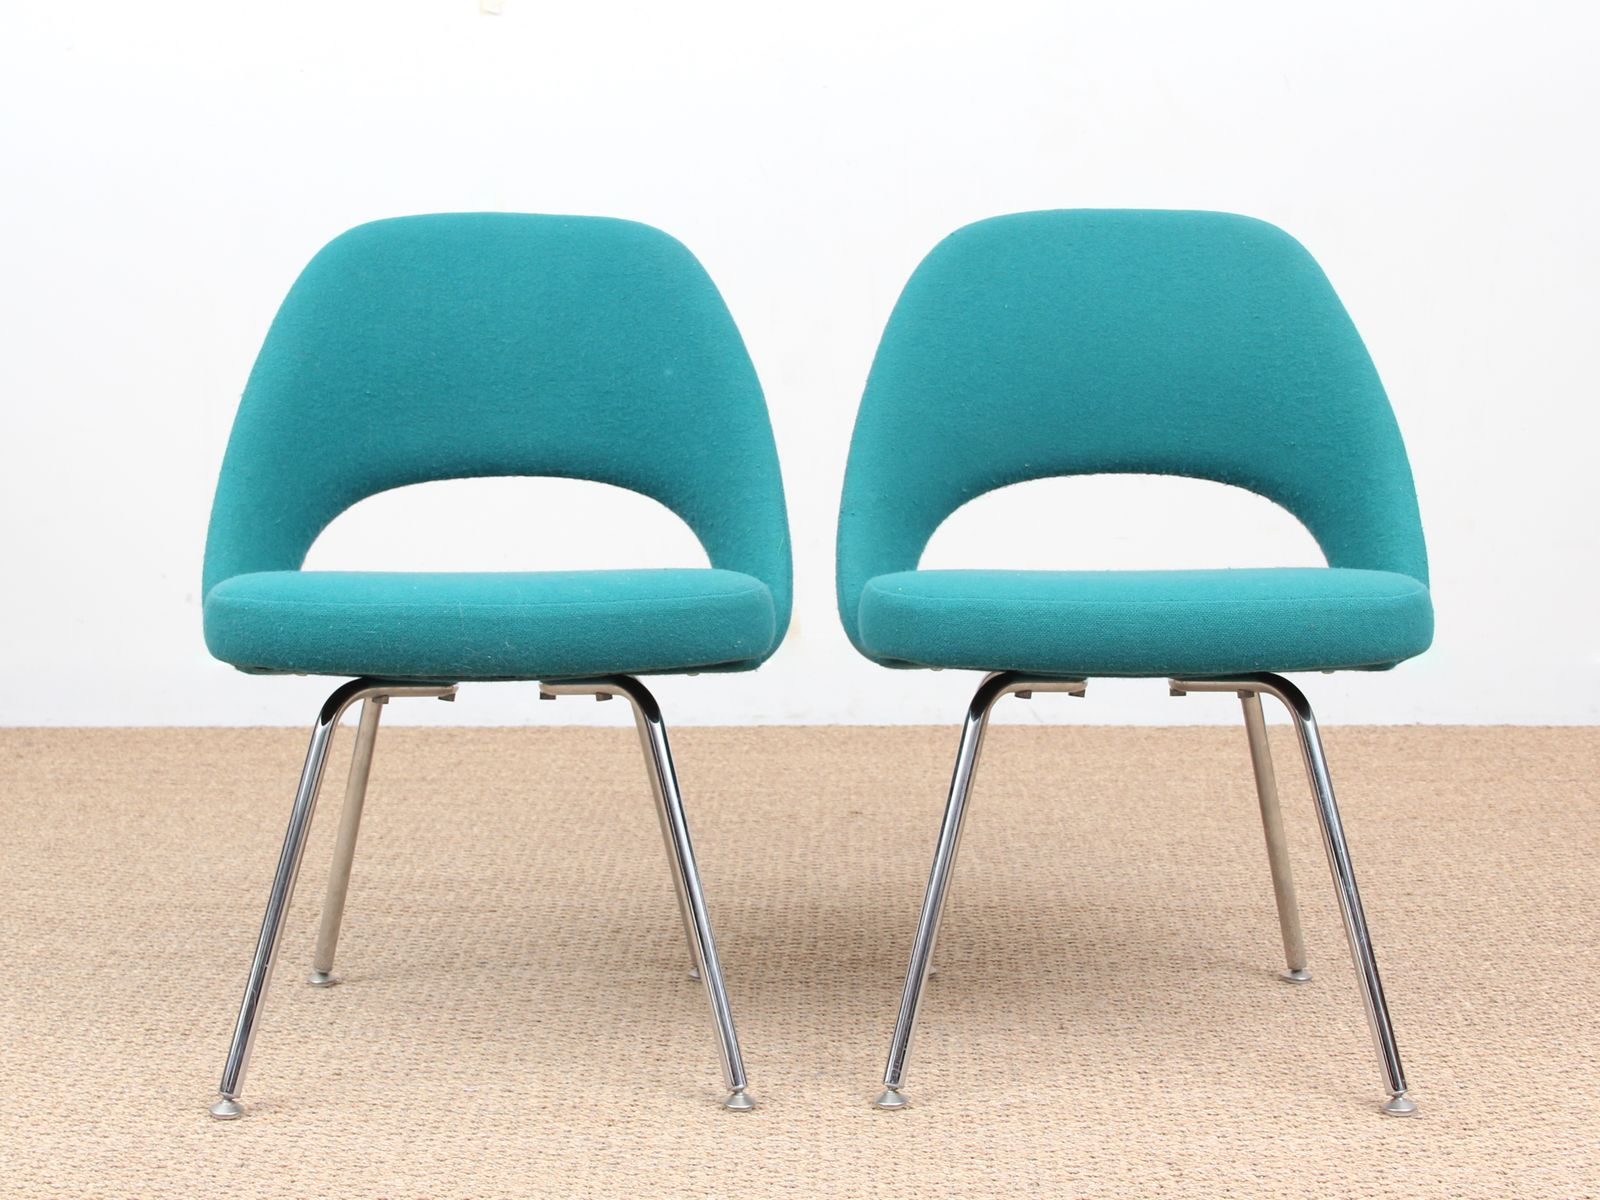 Ordinaire Scandinavian Executive Chairs By Eero Saarinen For Knoll, 1950s, Set Of 2